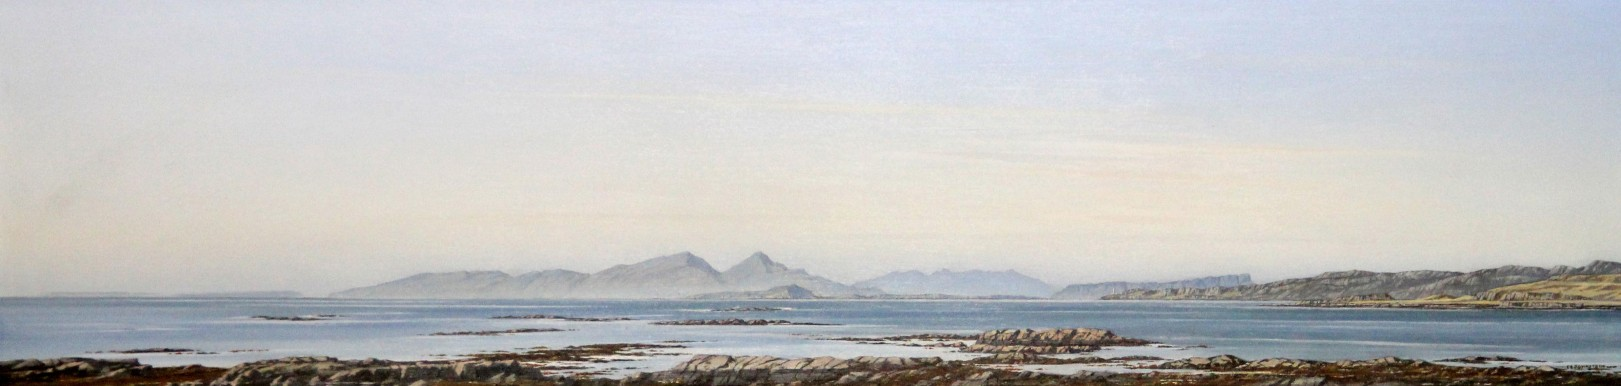 Ian Johnstone_Rum, Skye and Eigg from Mornish, Mull_Oils_7x26